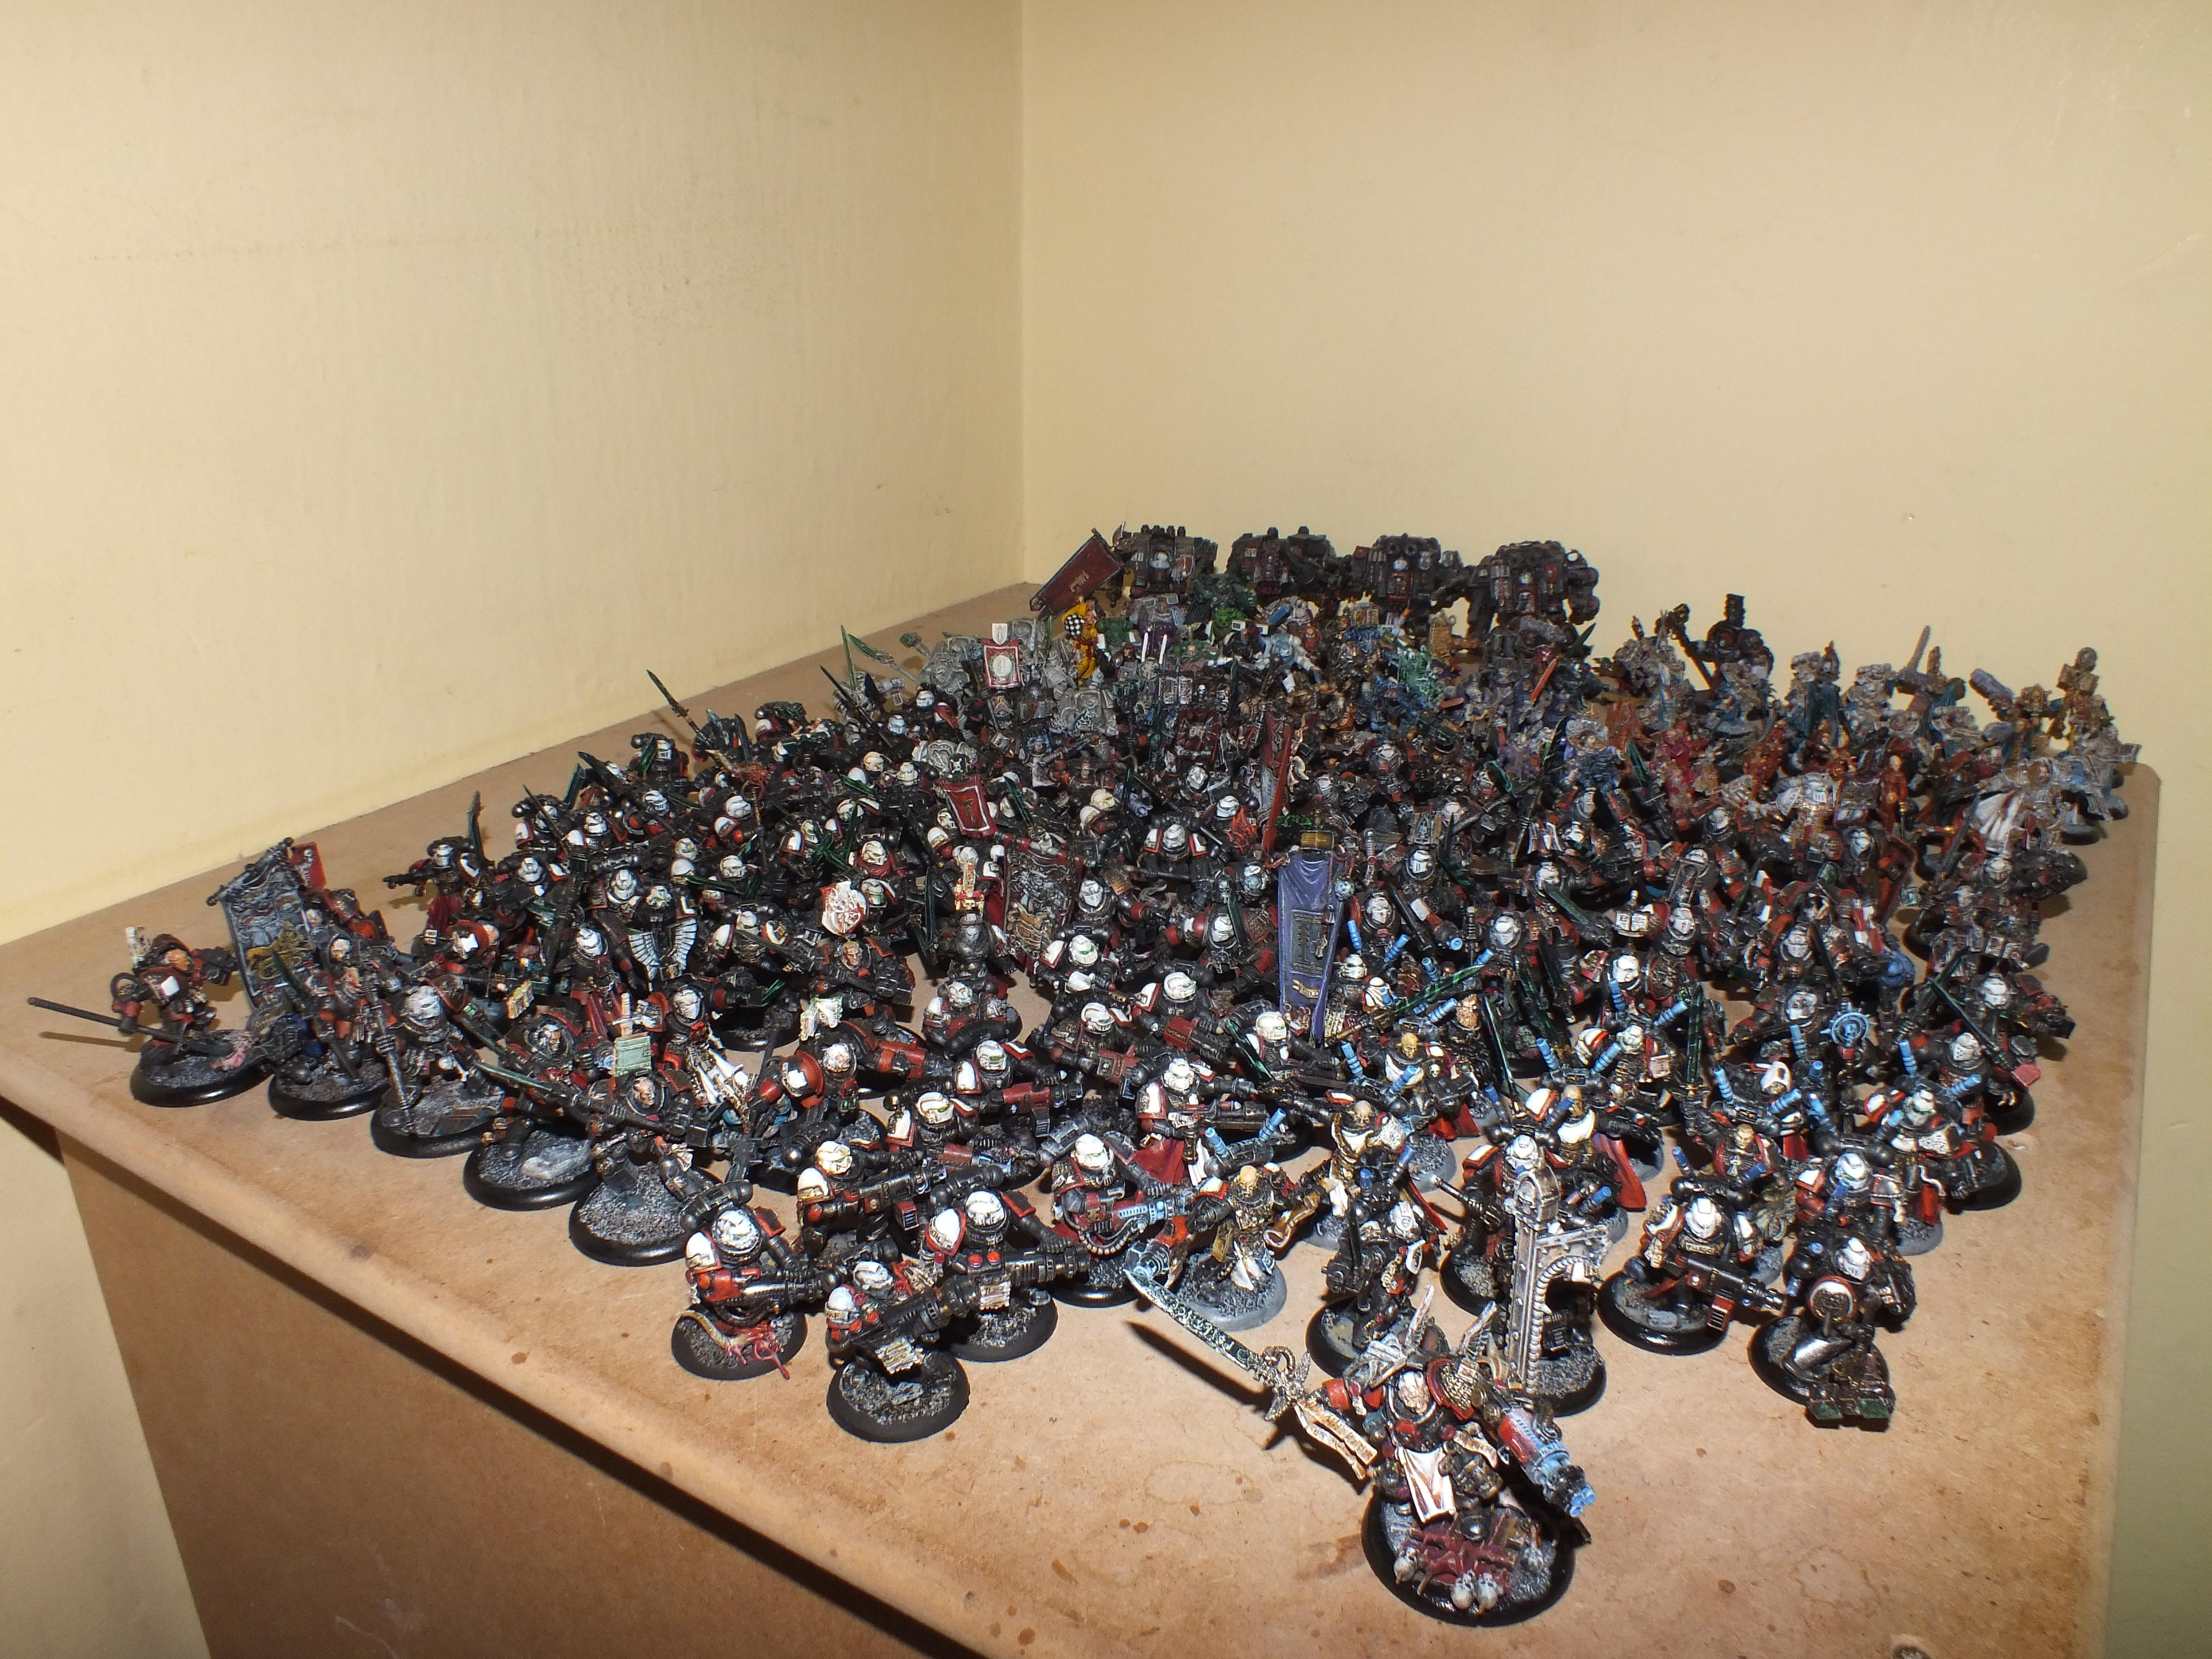 Grey Knights, Space Marines, Warhammer 40,000